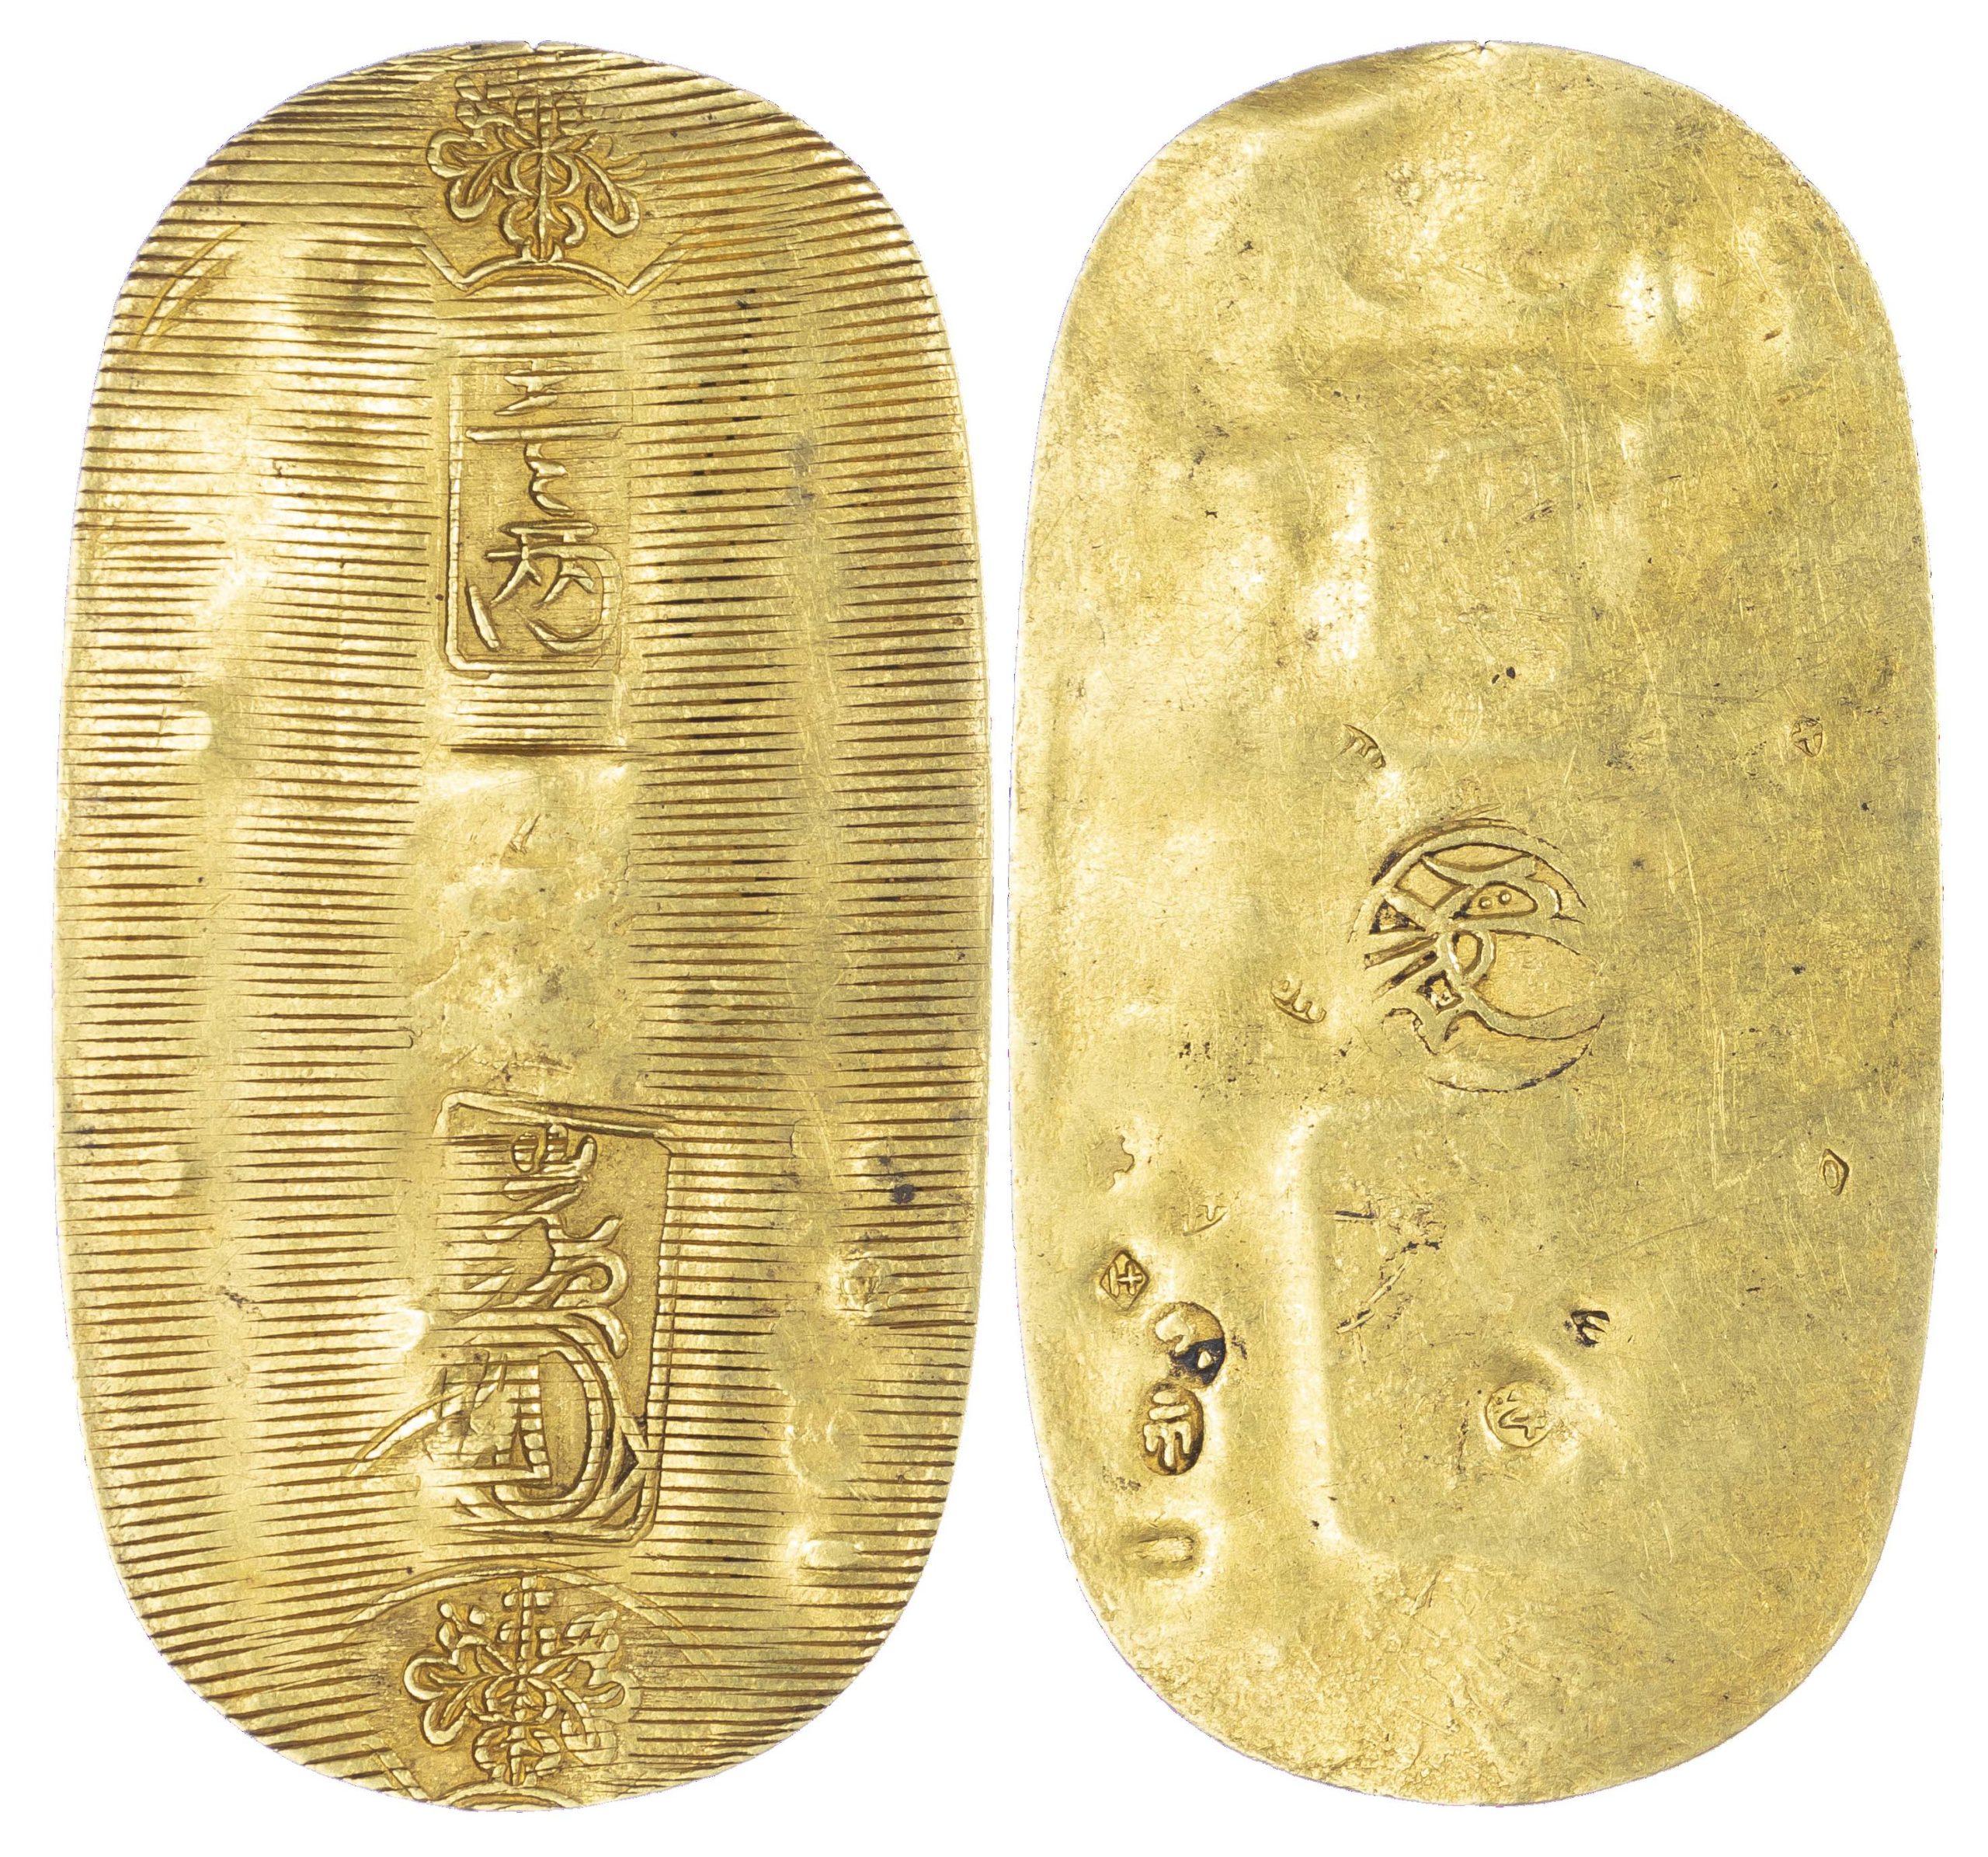 Japan, Keicho Era (1601-1695), gold Koban - very rare